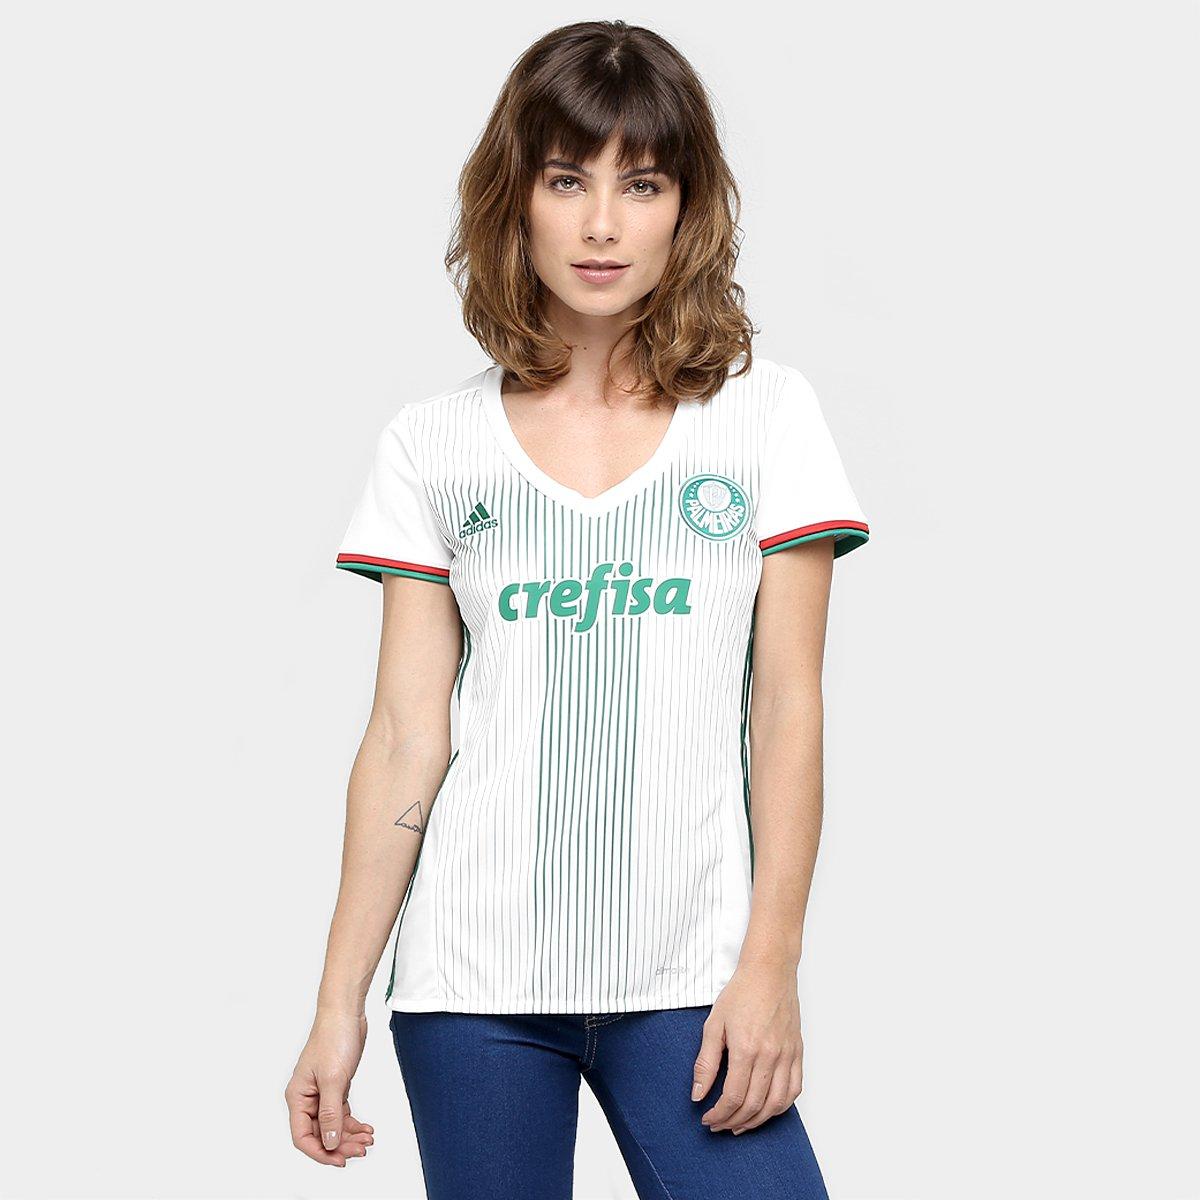 Camisa Palmeiras II 2016 s nº Torcedor Adidas Feminina - Compre ... fd2aa3a8a7c4d